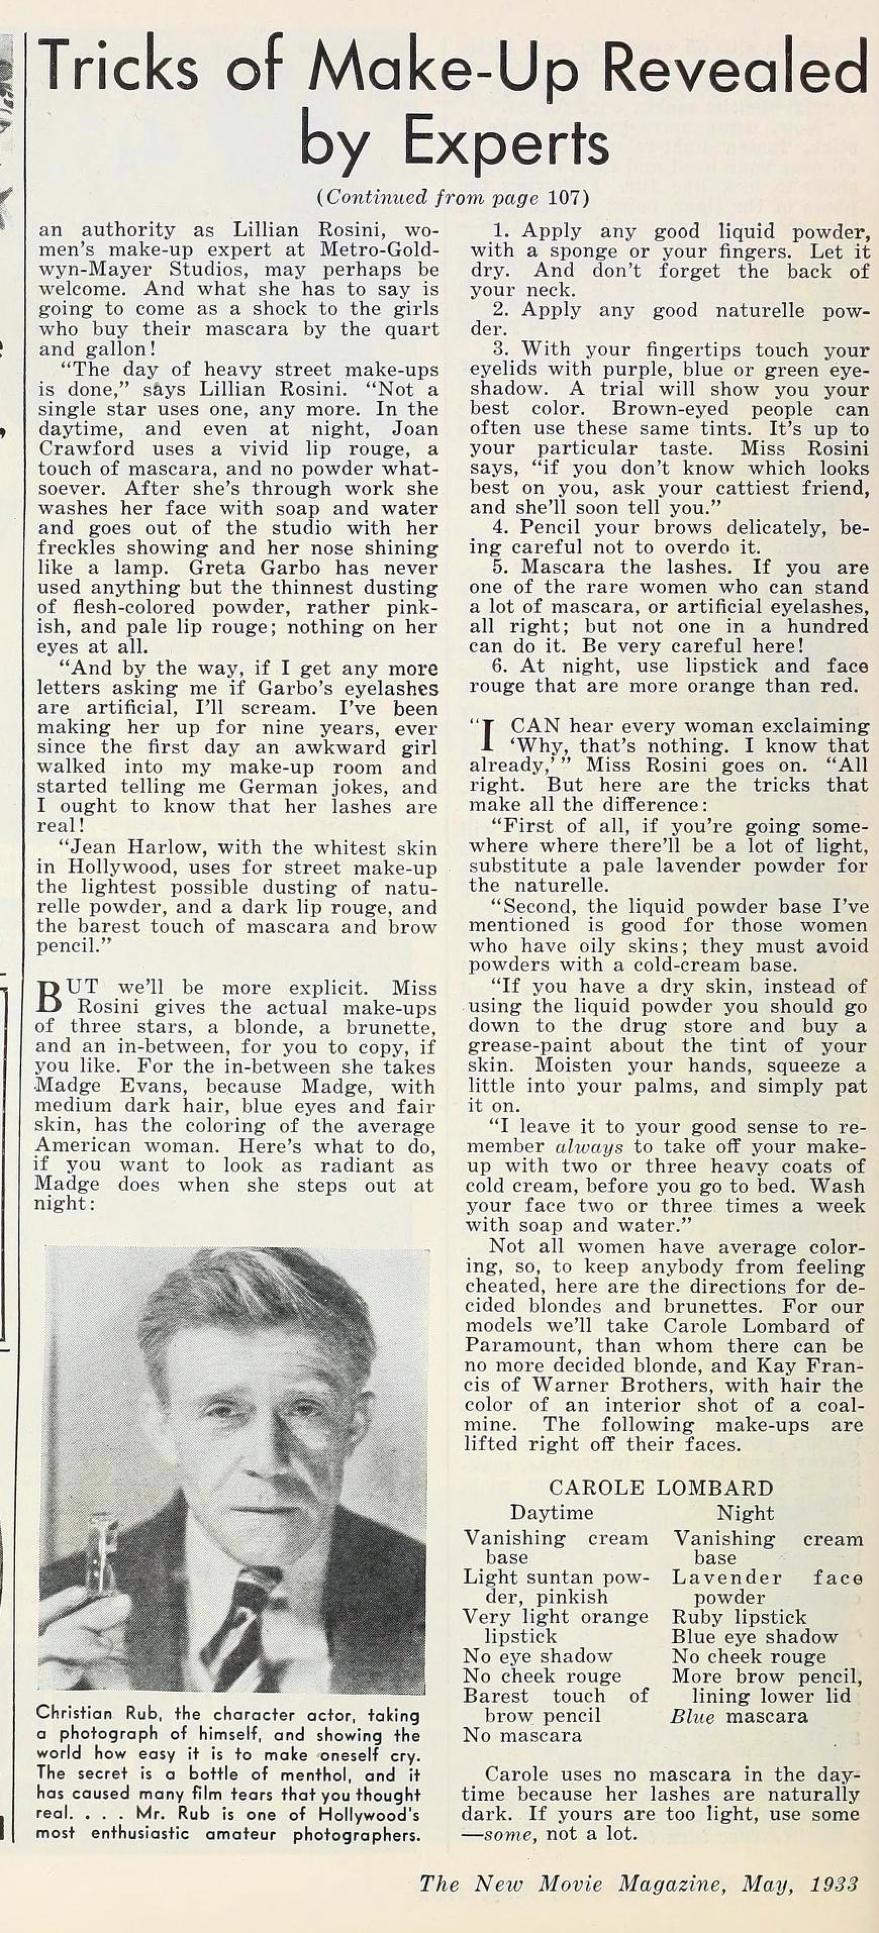 carole lombard the new movie magazine may 1933ea